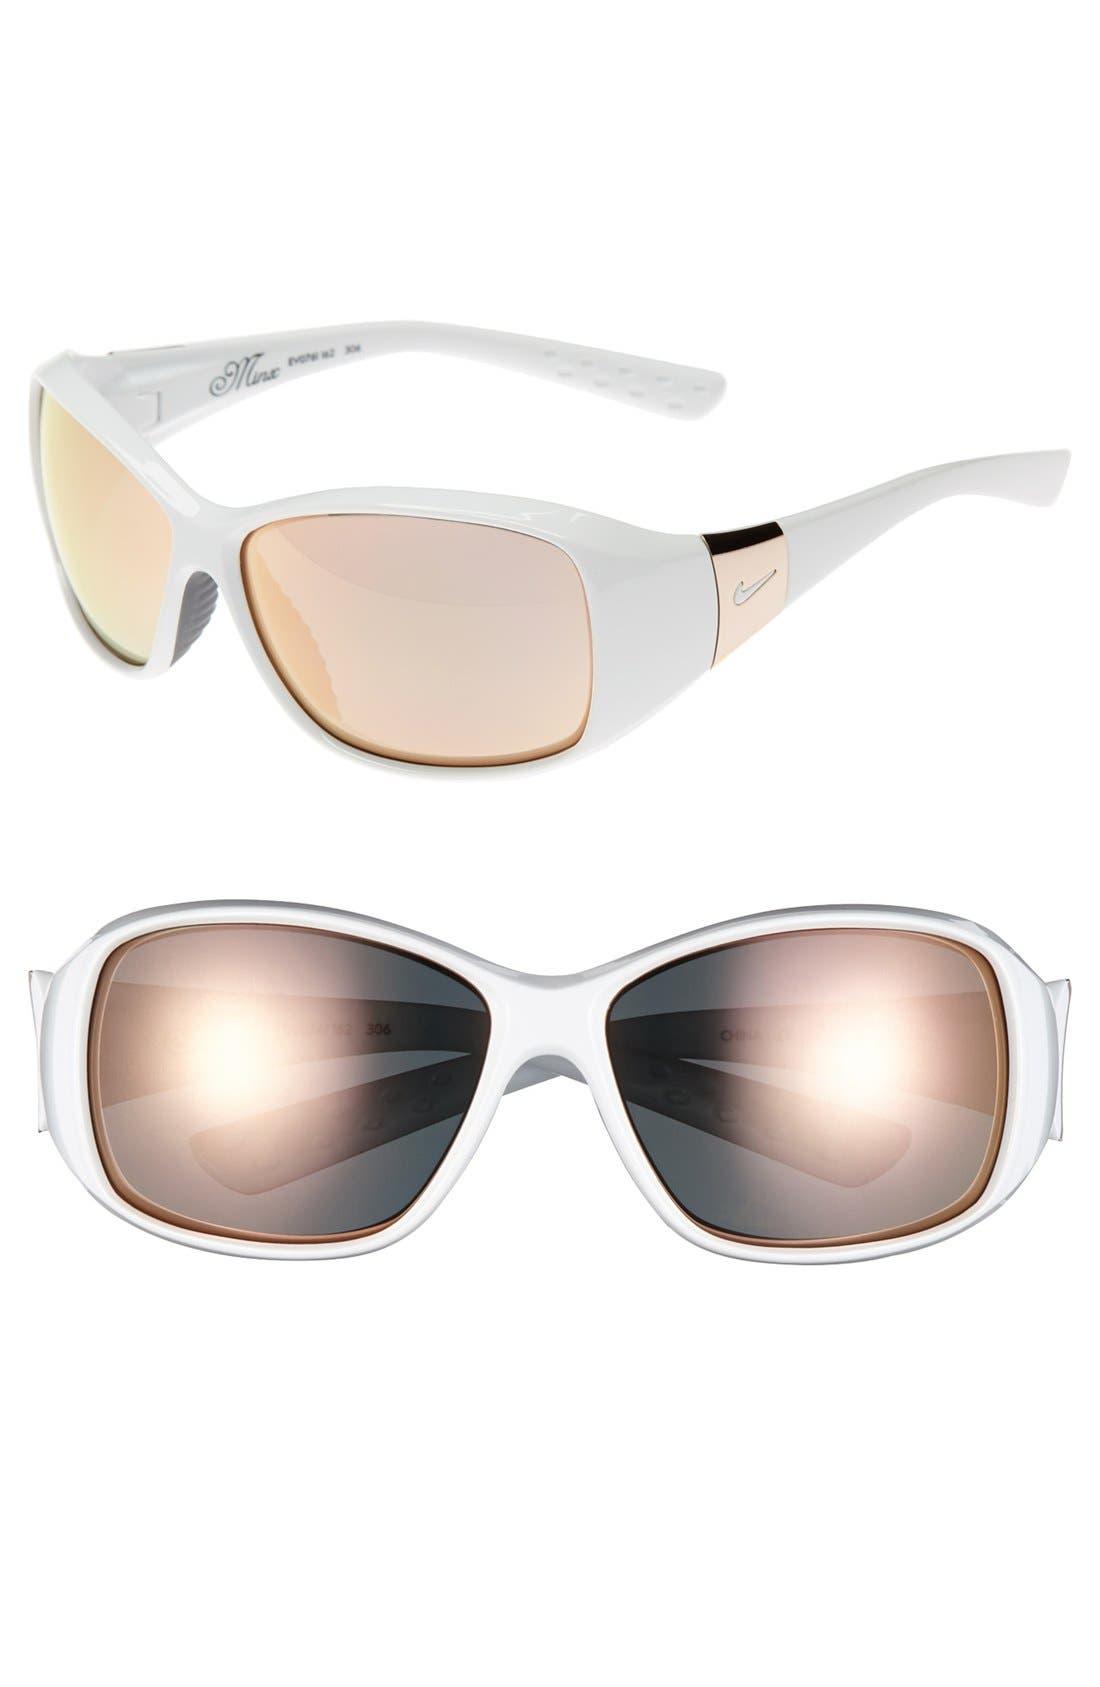 Main Image - Nike 'Minx' Sunglasses